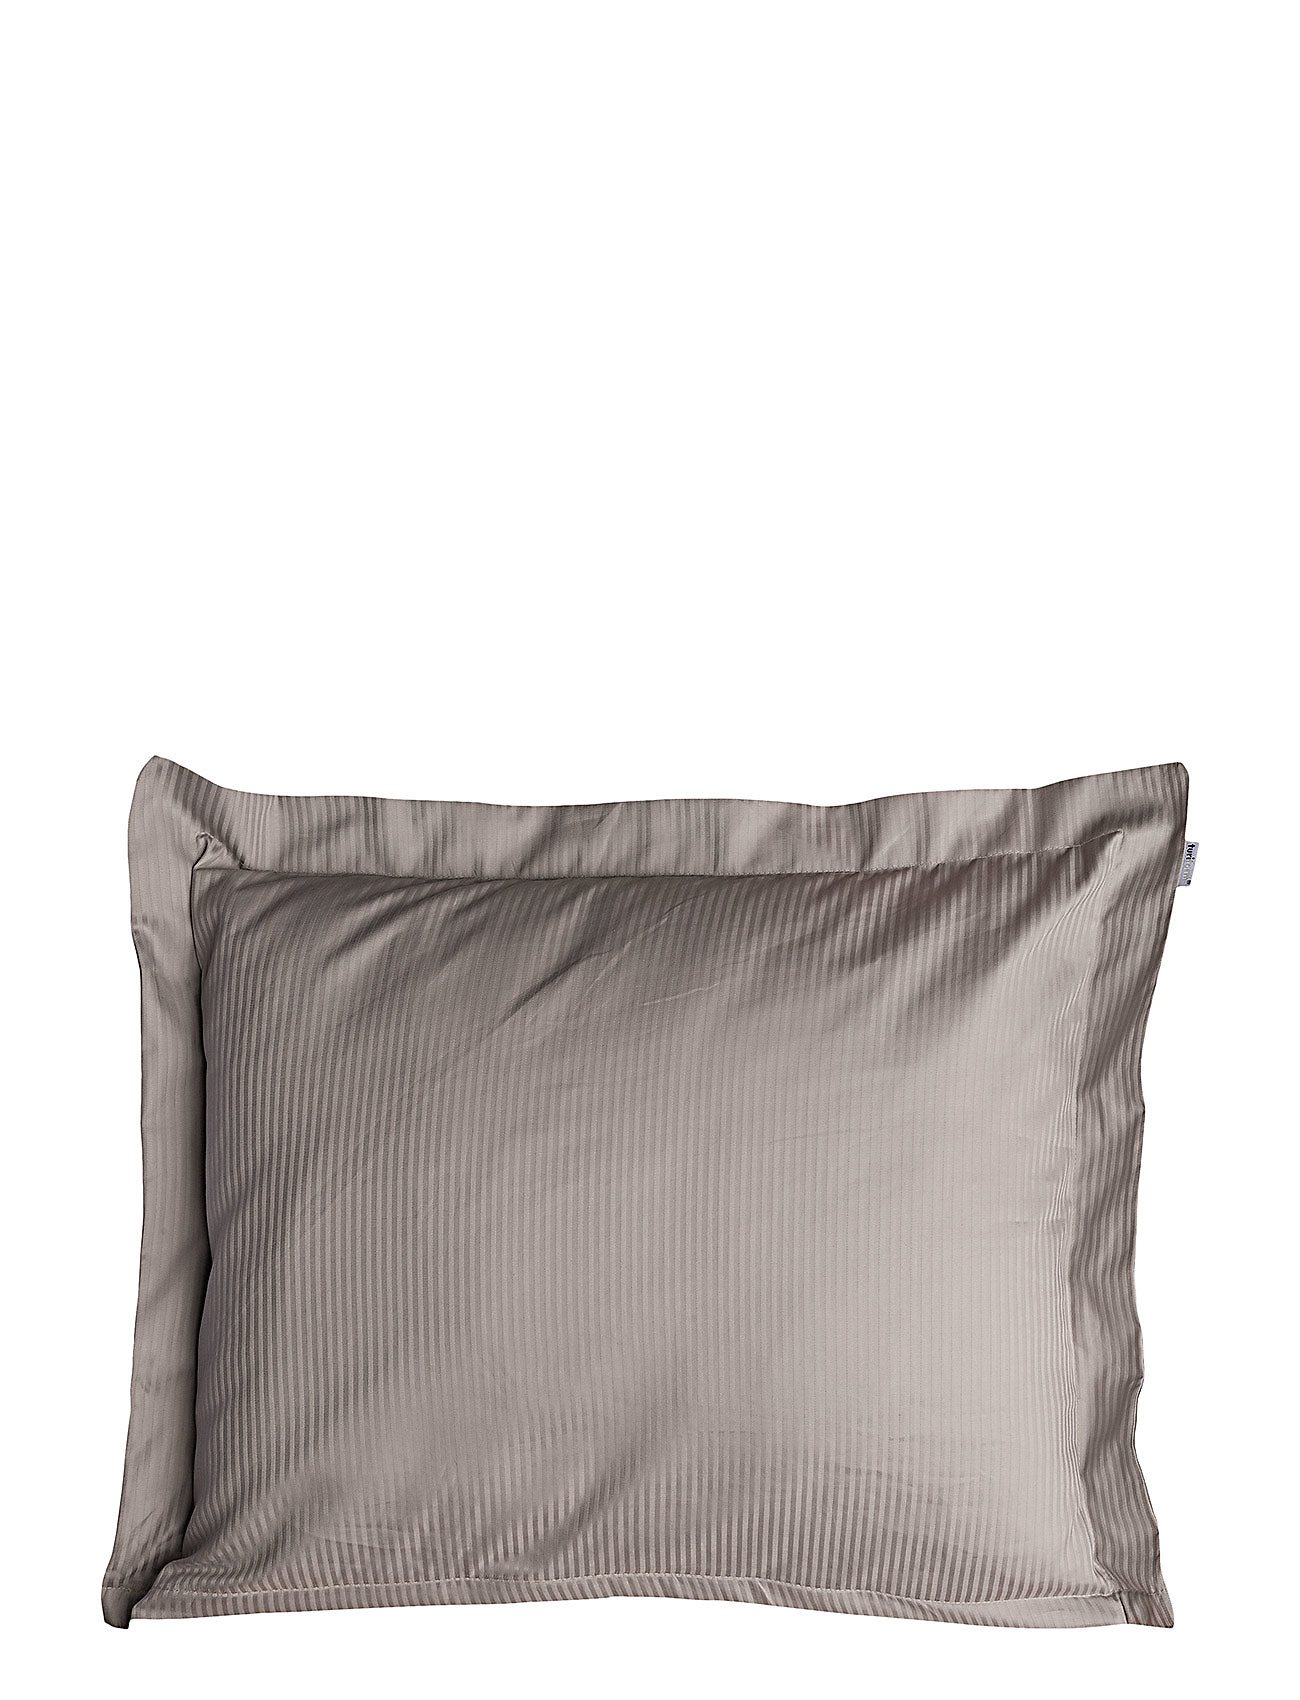 Turiform Turistripe Pillowcase - LIGHT GREY